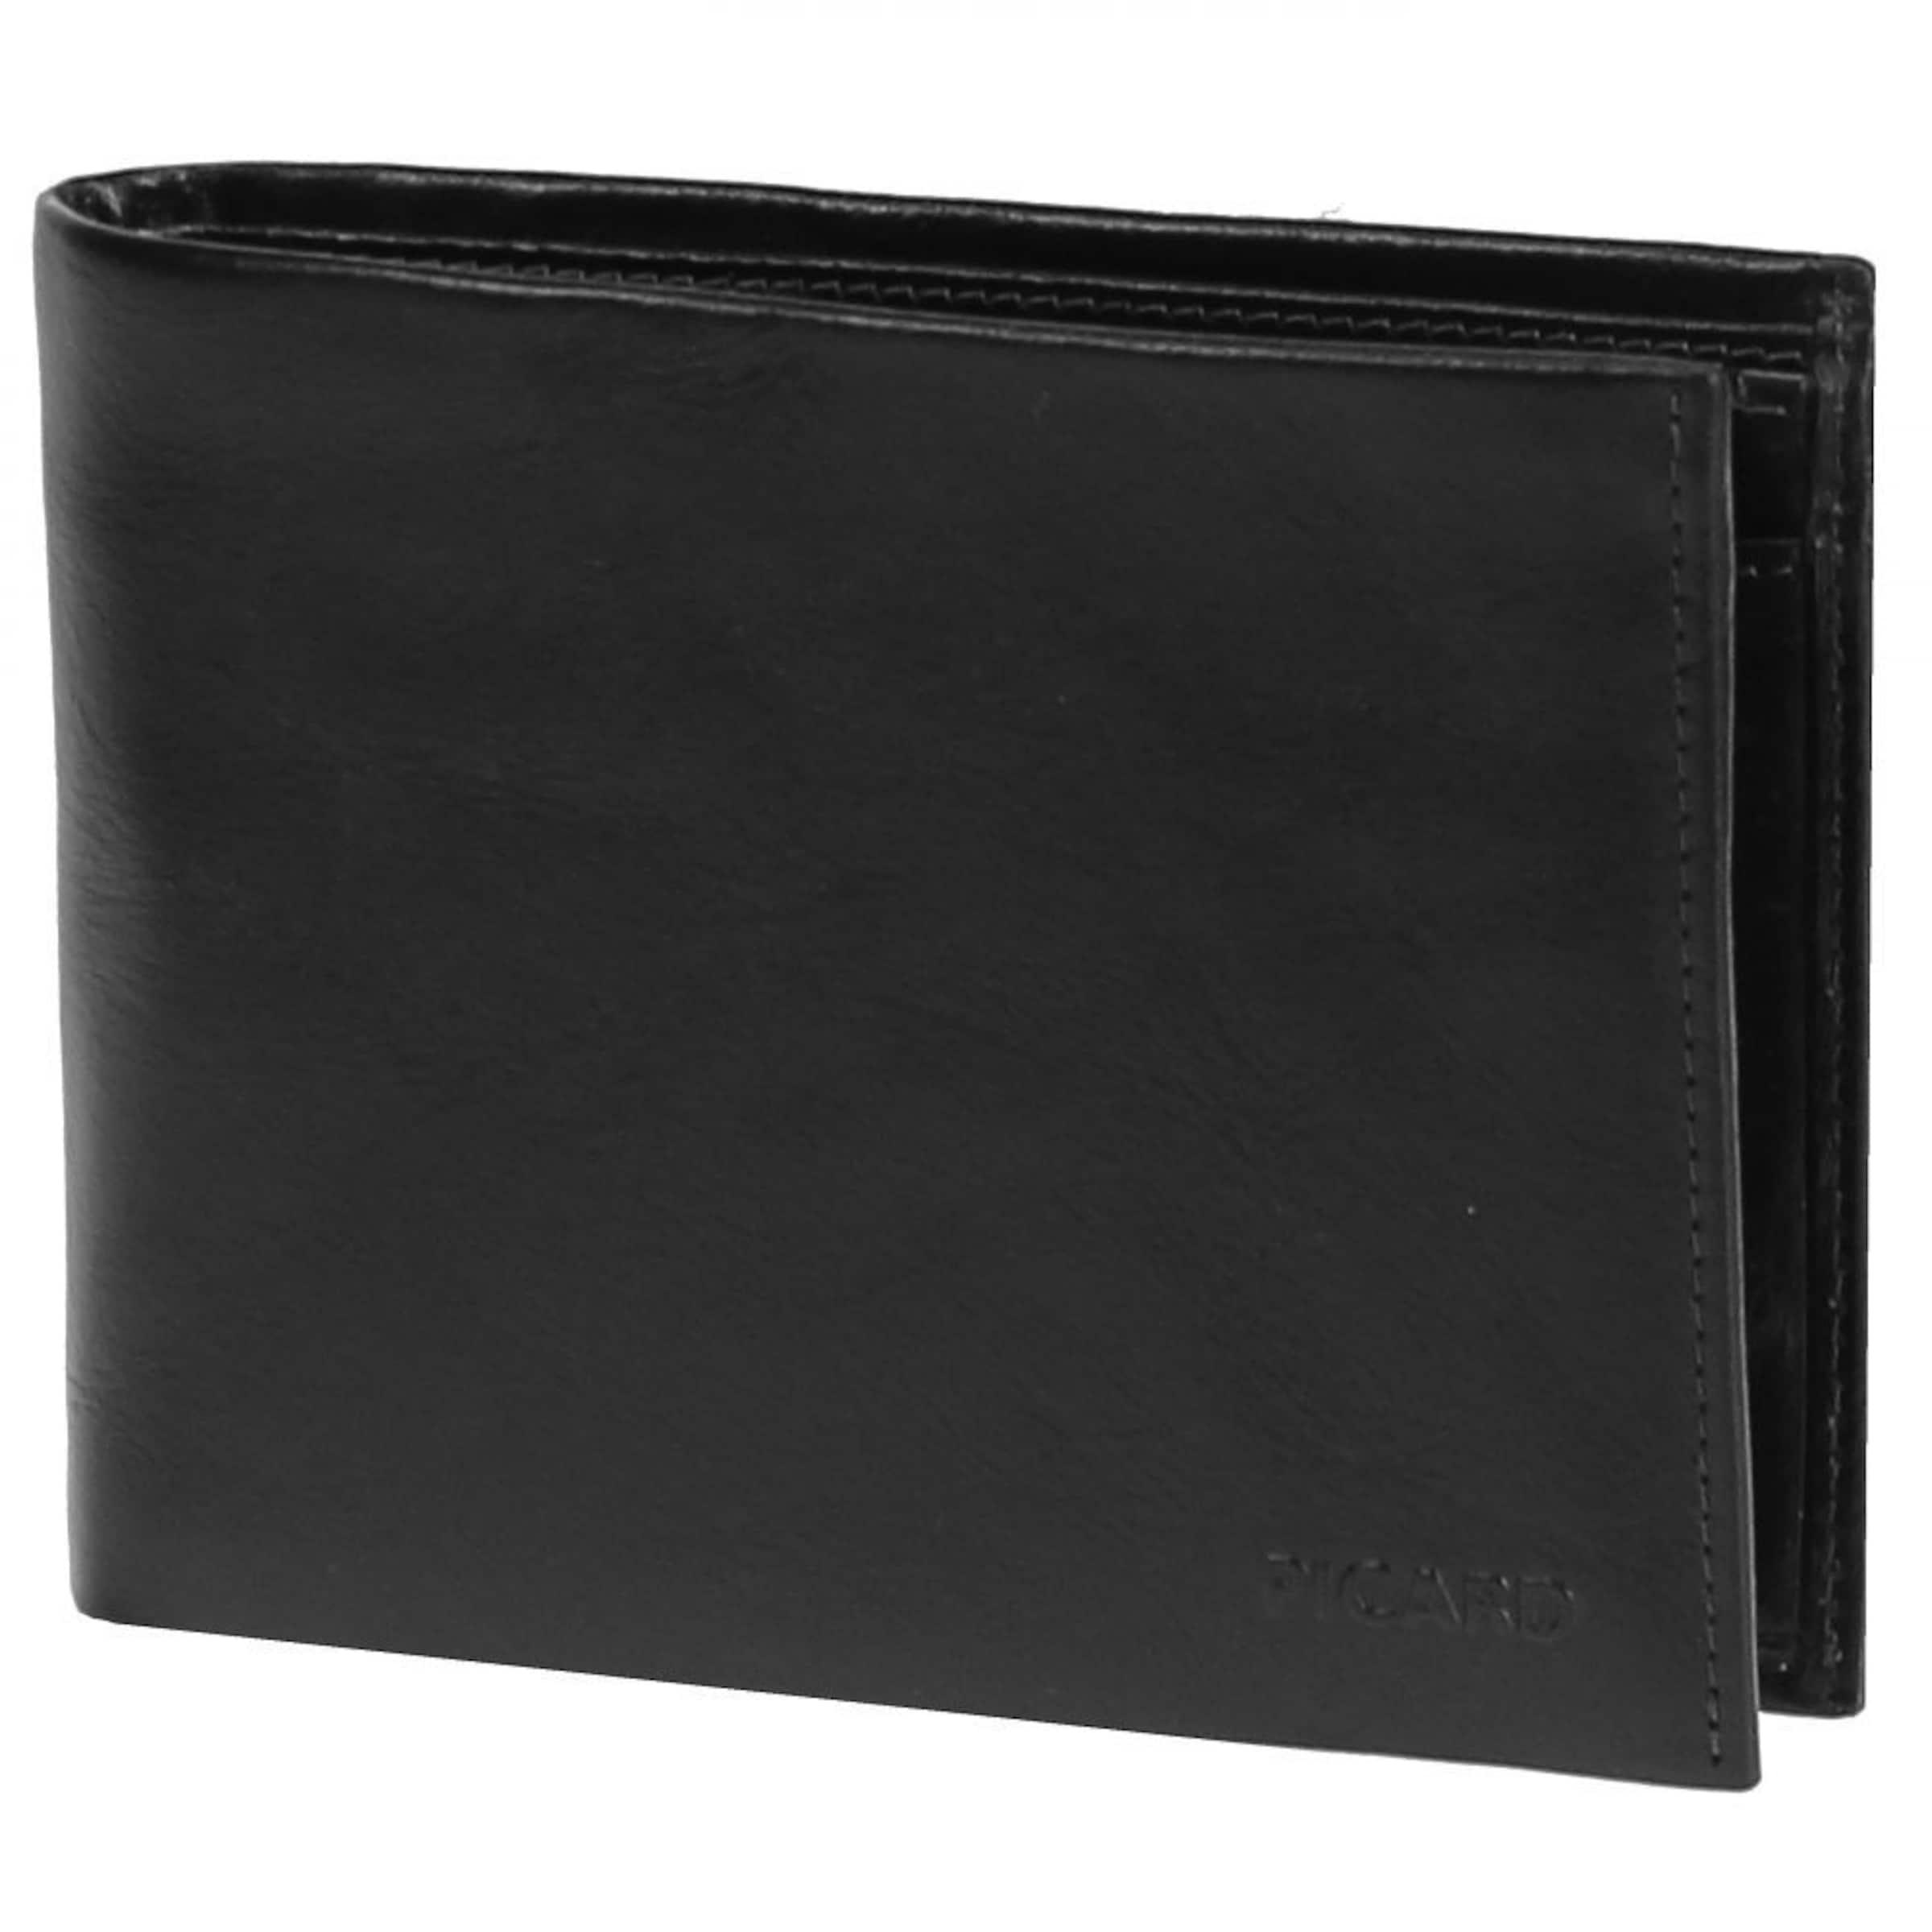 Picard Apache Geldbörse Leder 12cm Outlet-Store Billig Verkauf Footlocker Bilder LViaEozm98